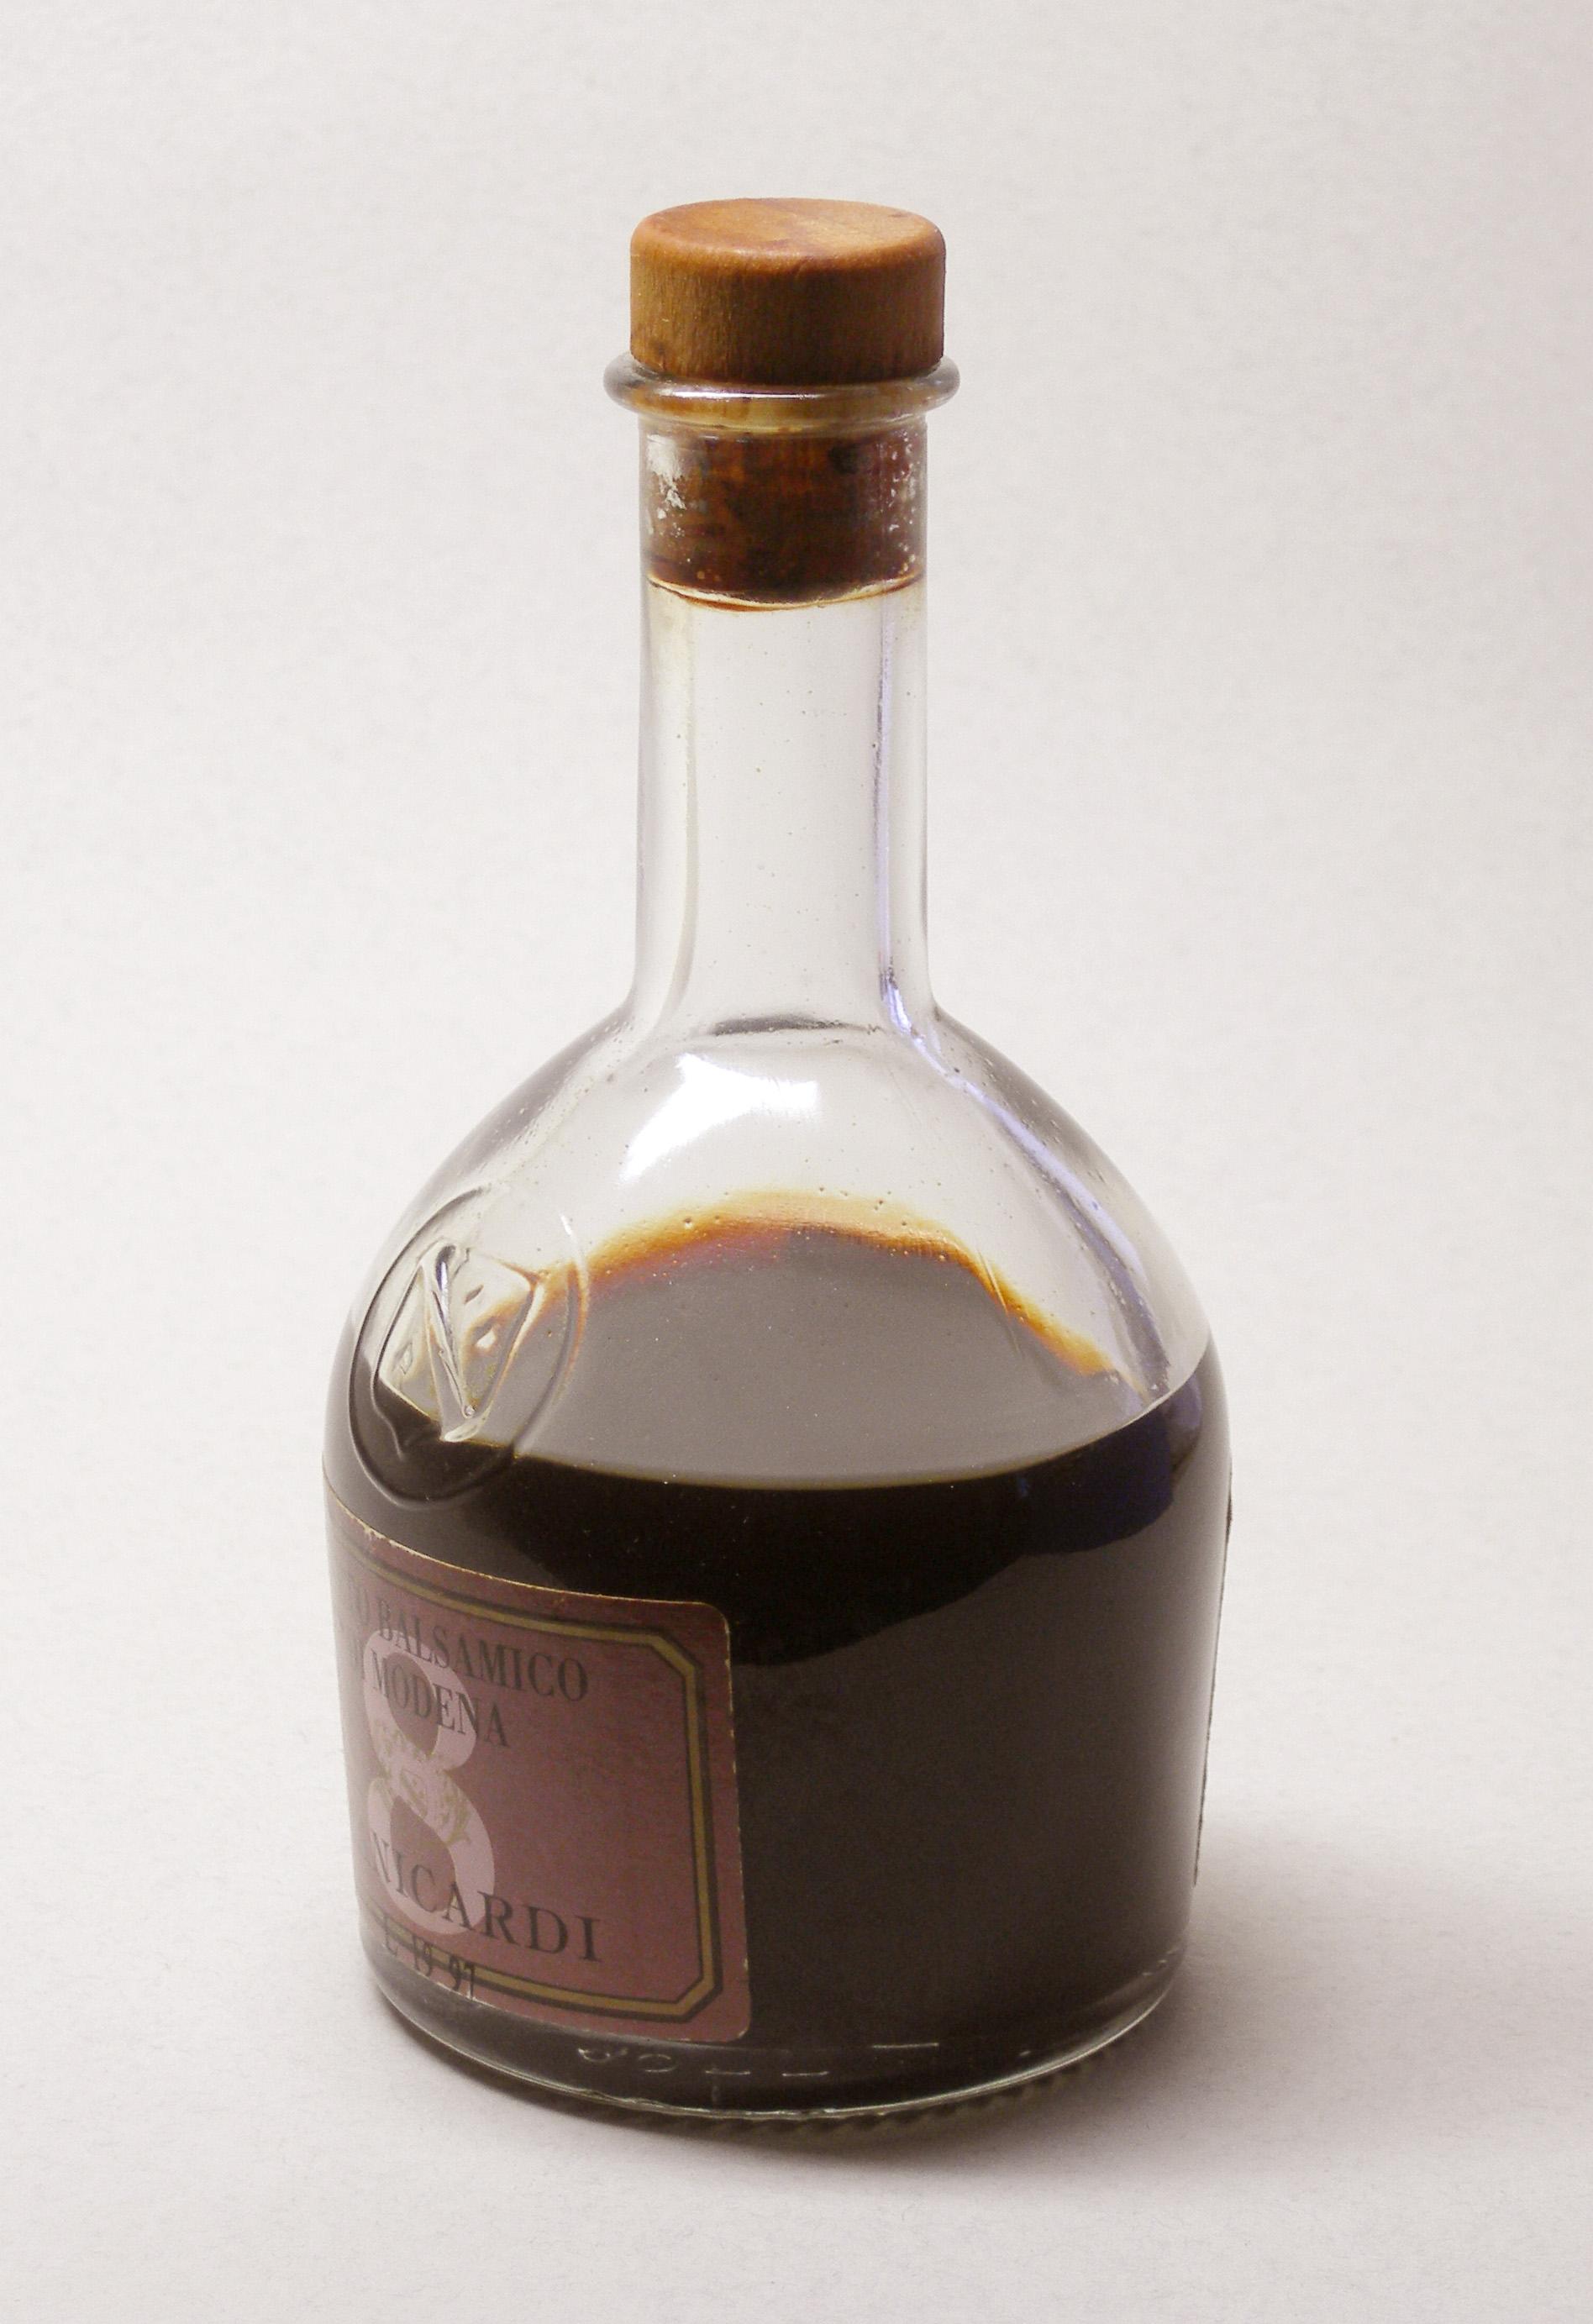 Balsamic vinegar - Wikipedia